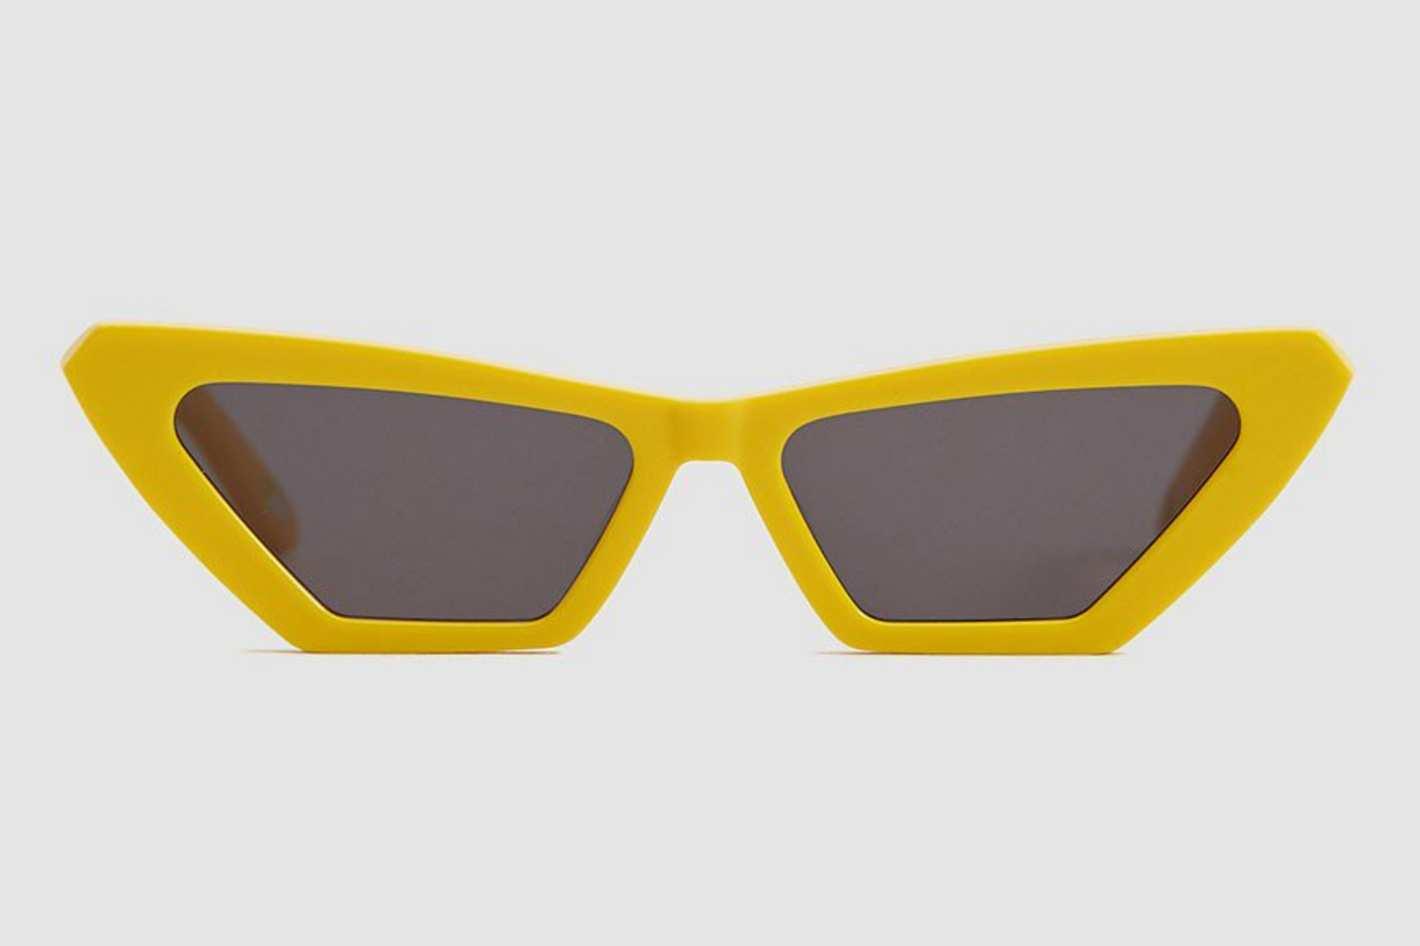 Chimi Eyewear Tiger Square Yellow Sunglasses